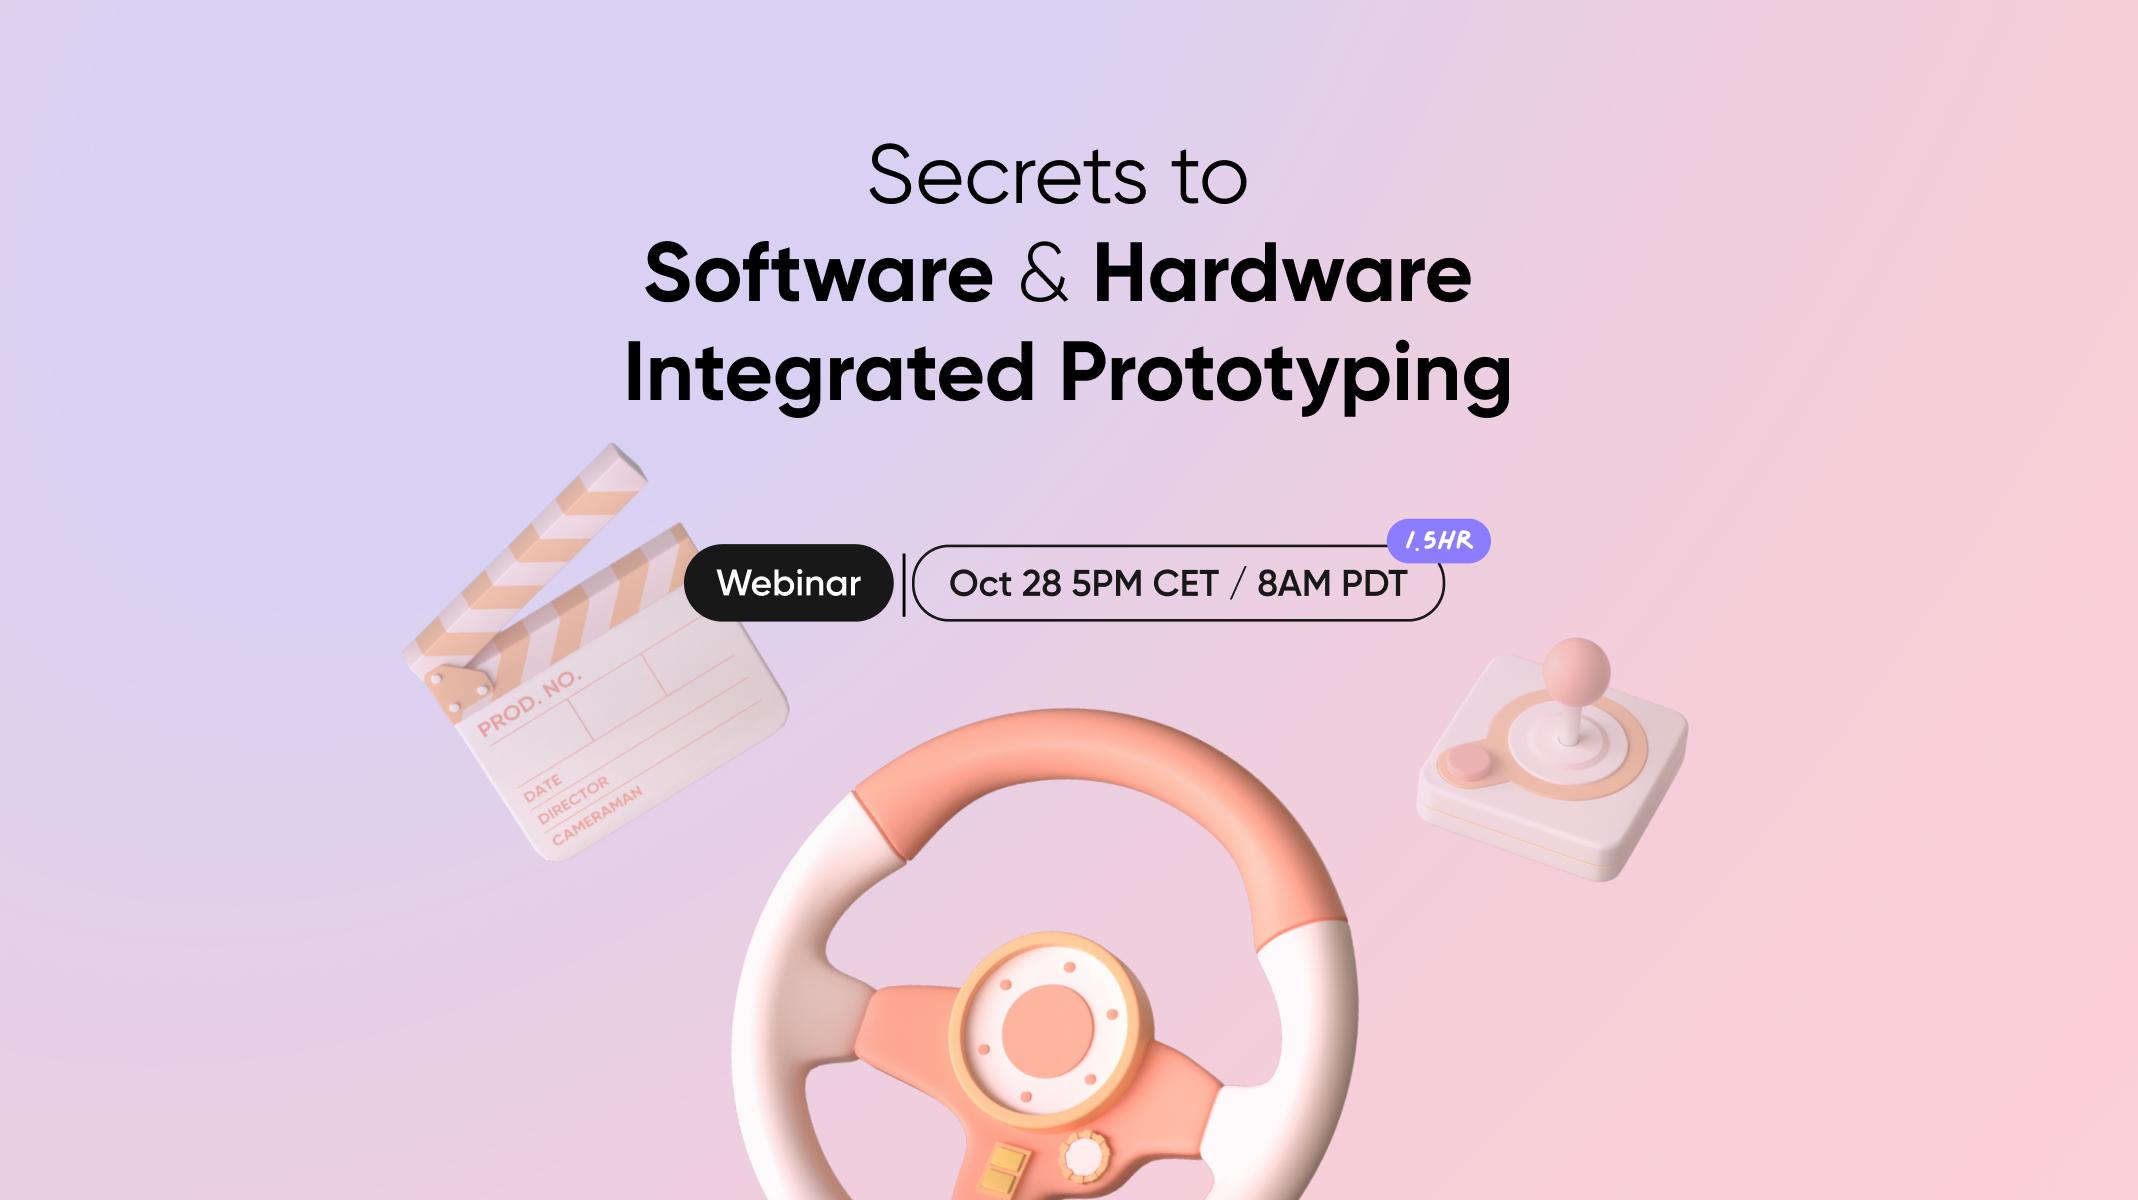 ProtoPie Webinar Secrets to Software & Hardware Integrated Prototyping thumbnail